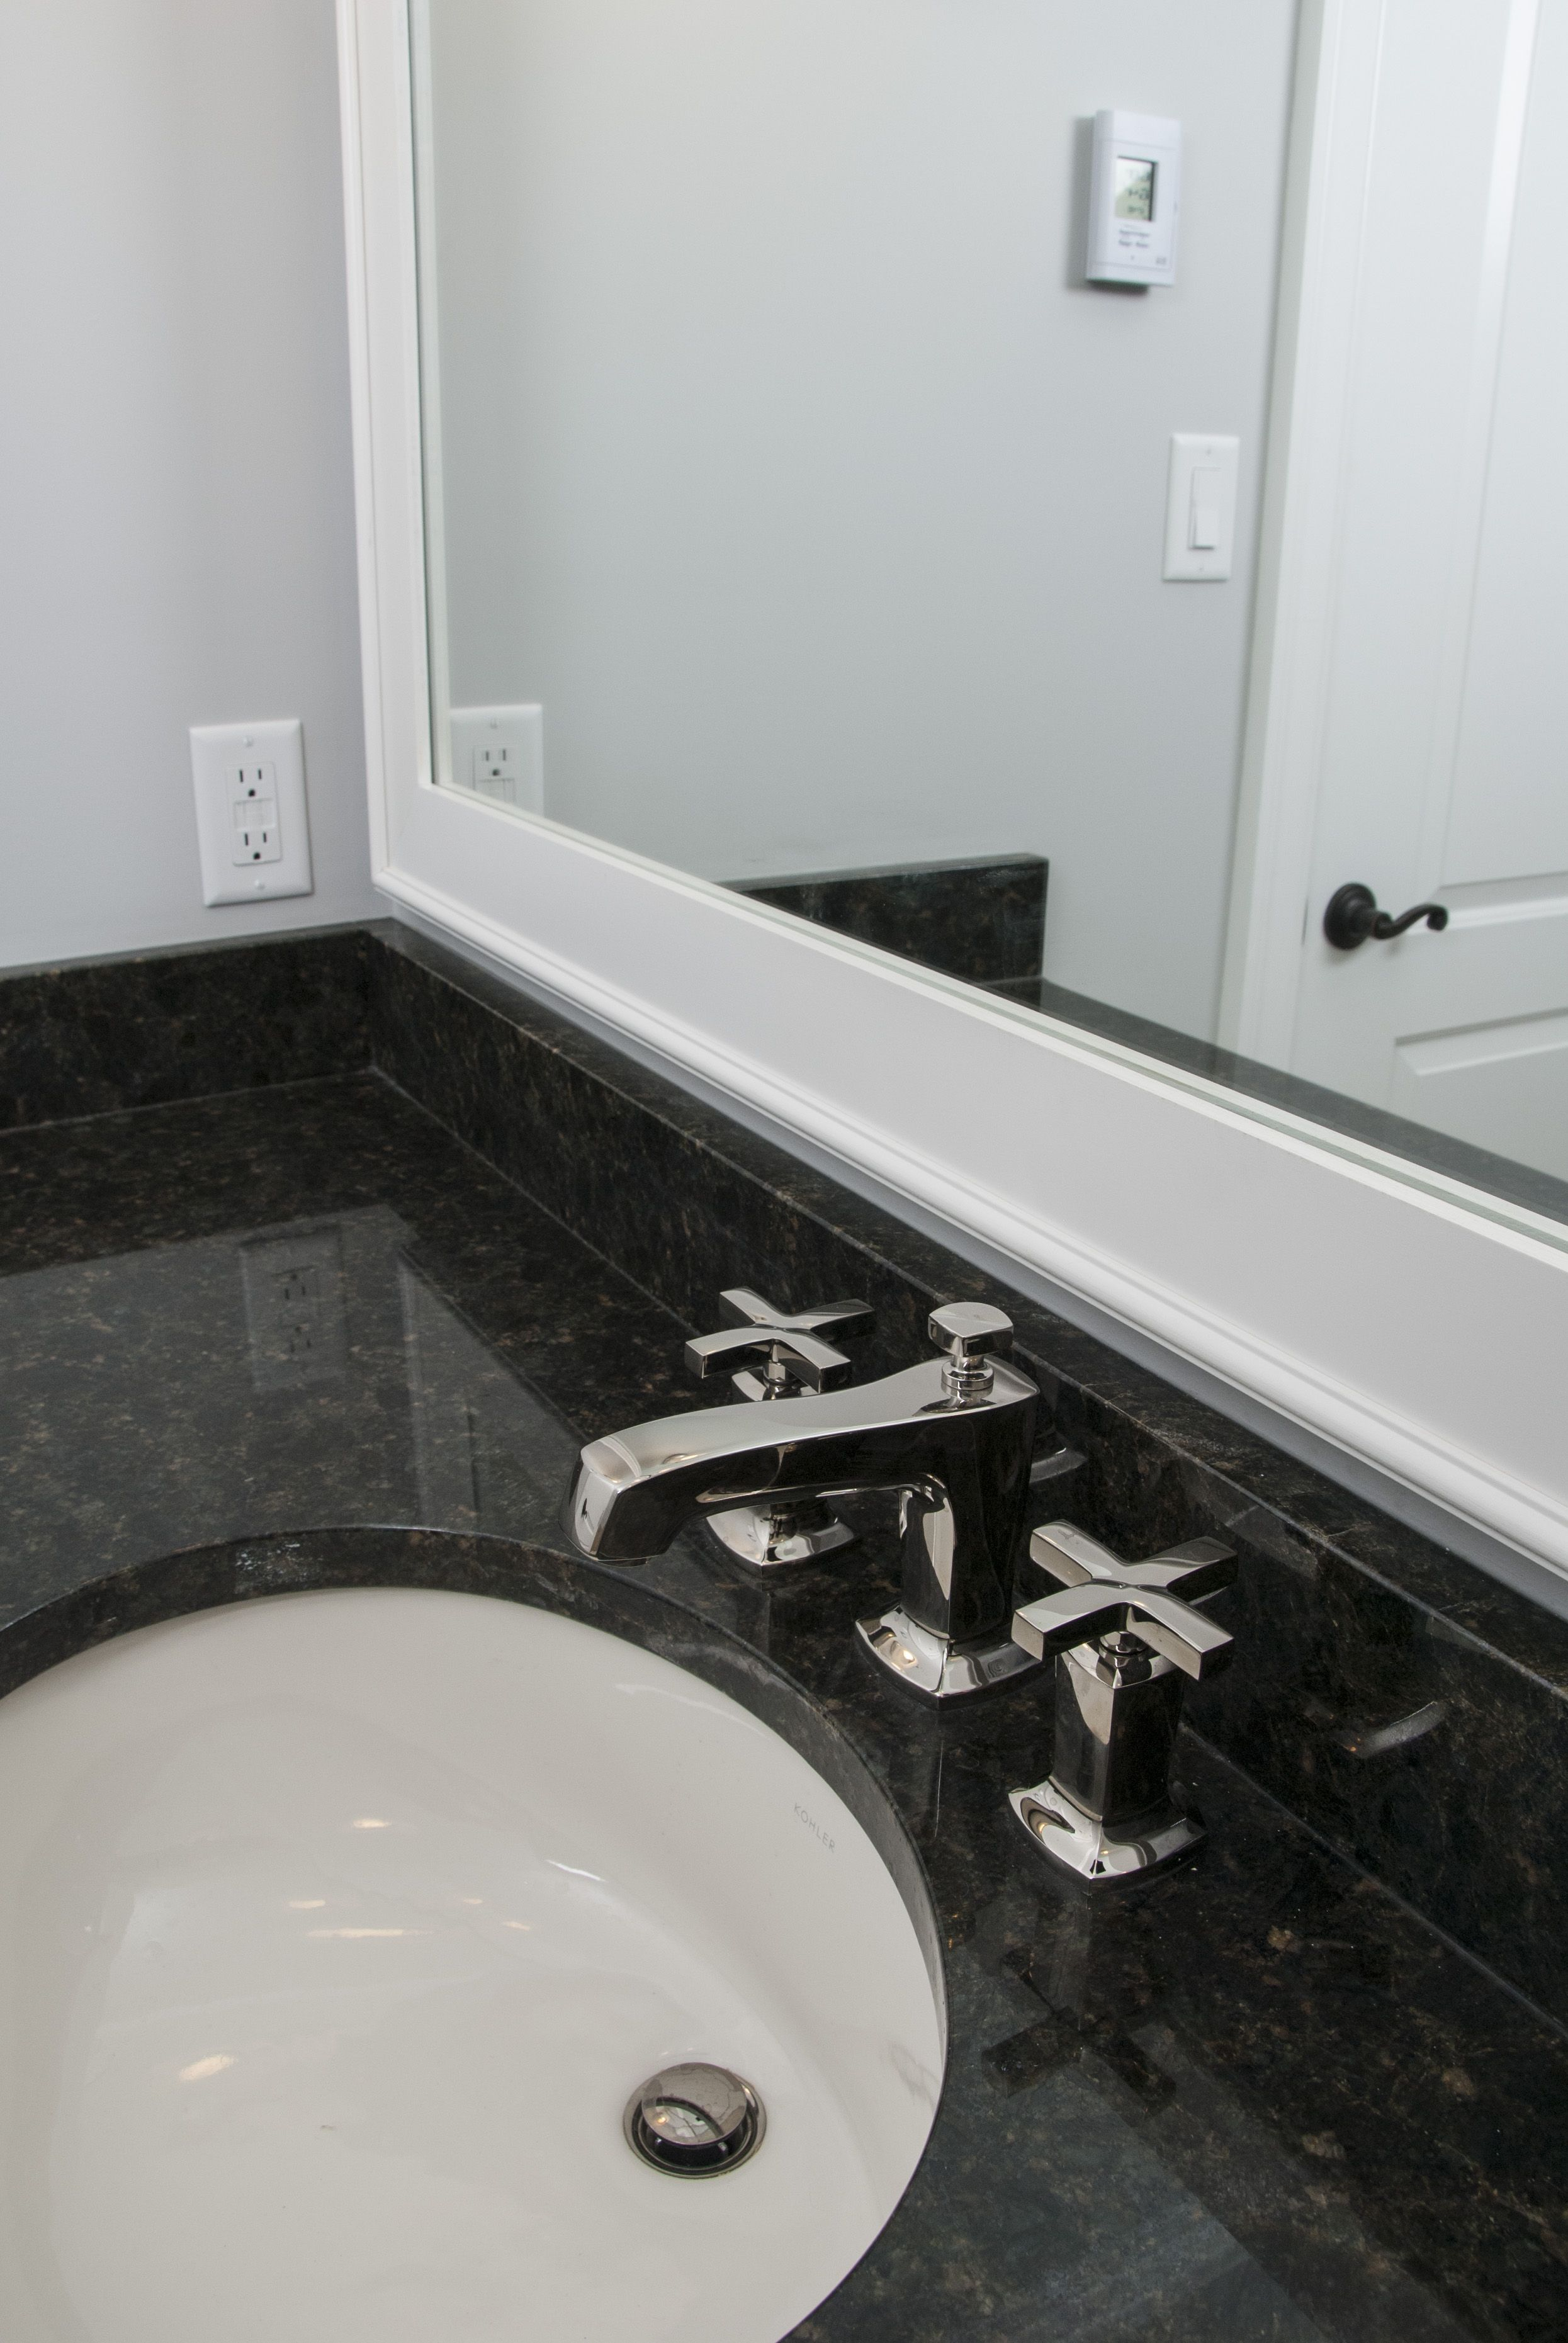 White Vanity Kohler Faucets Purist Faucets Brushed Nickel